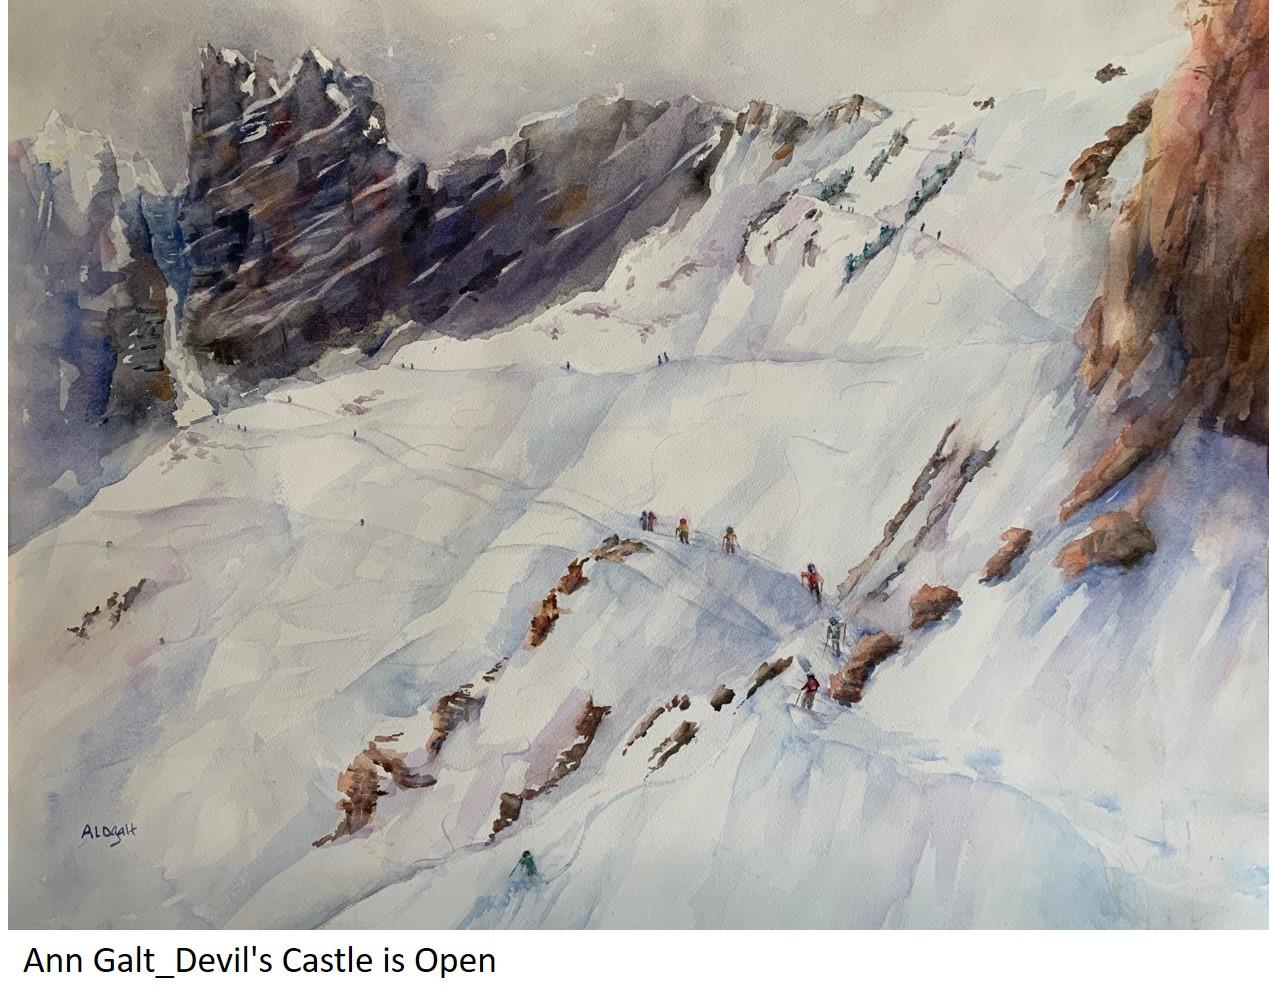 Galt_Ann_Devil's Castle is Open_labeled